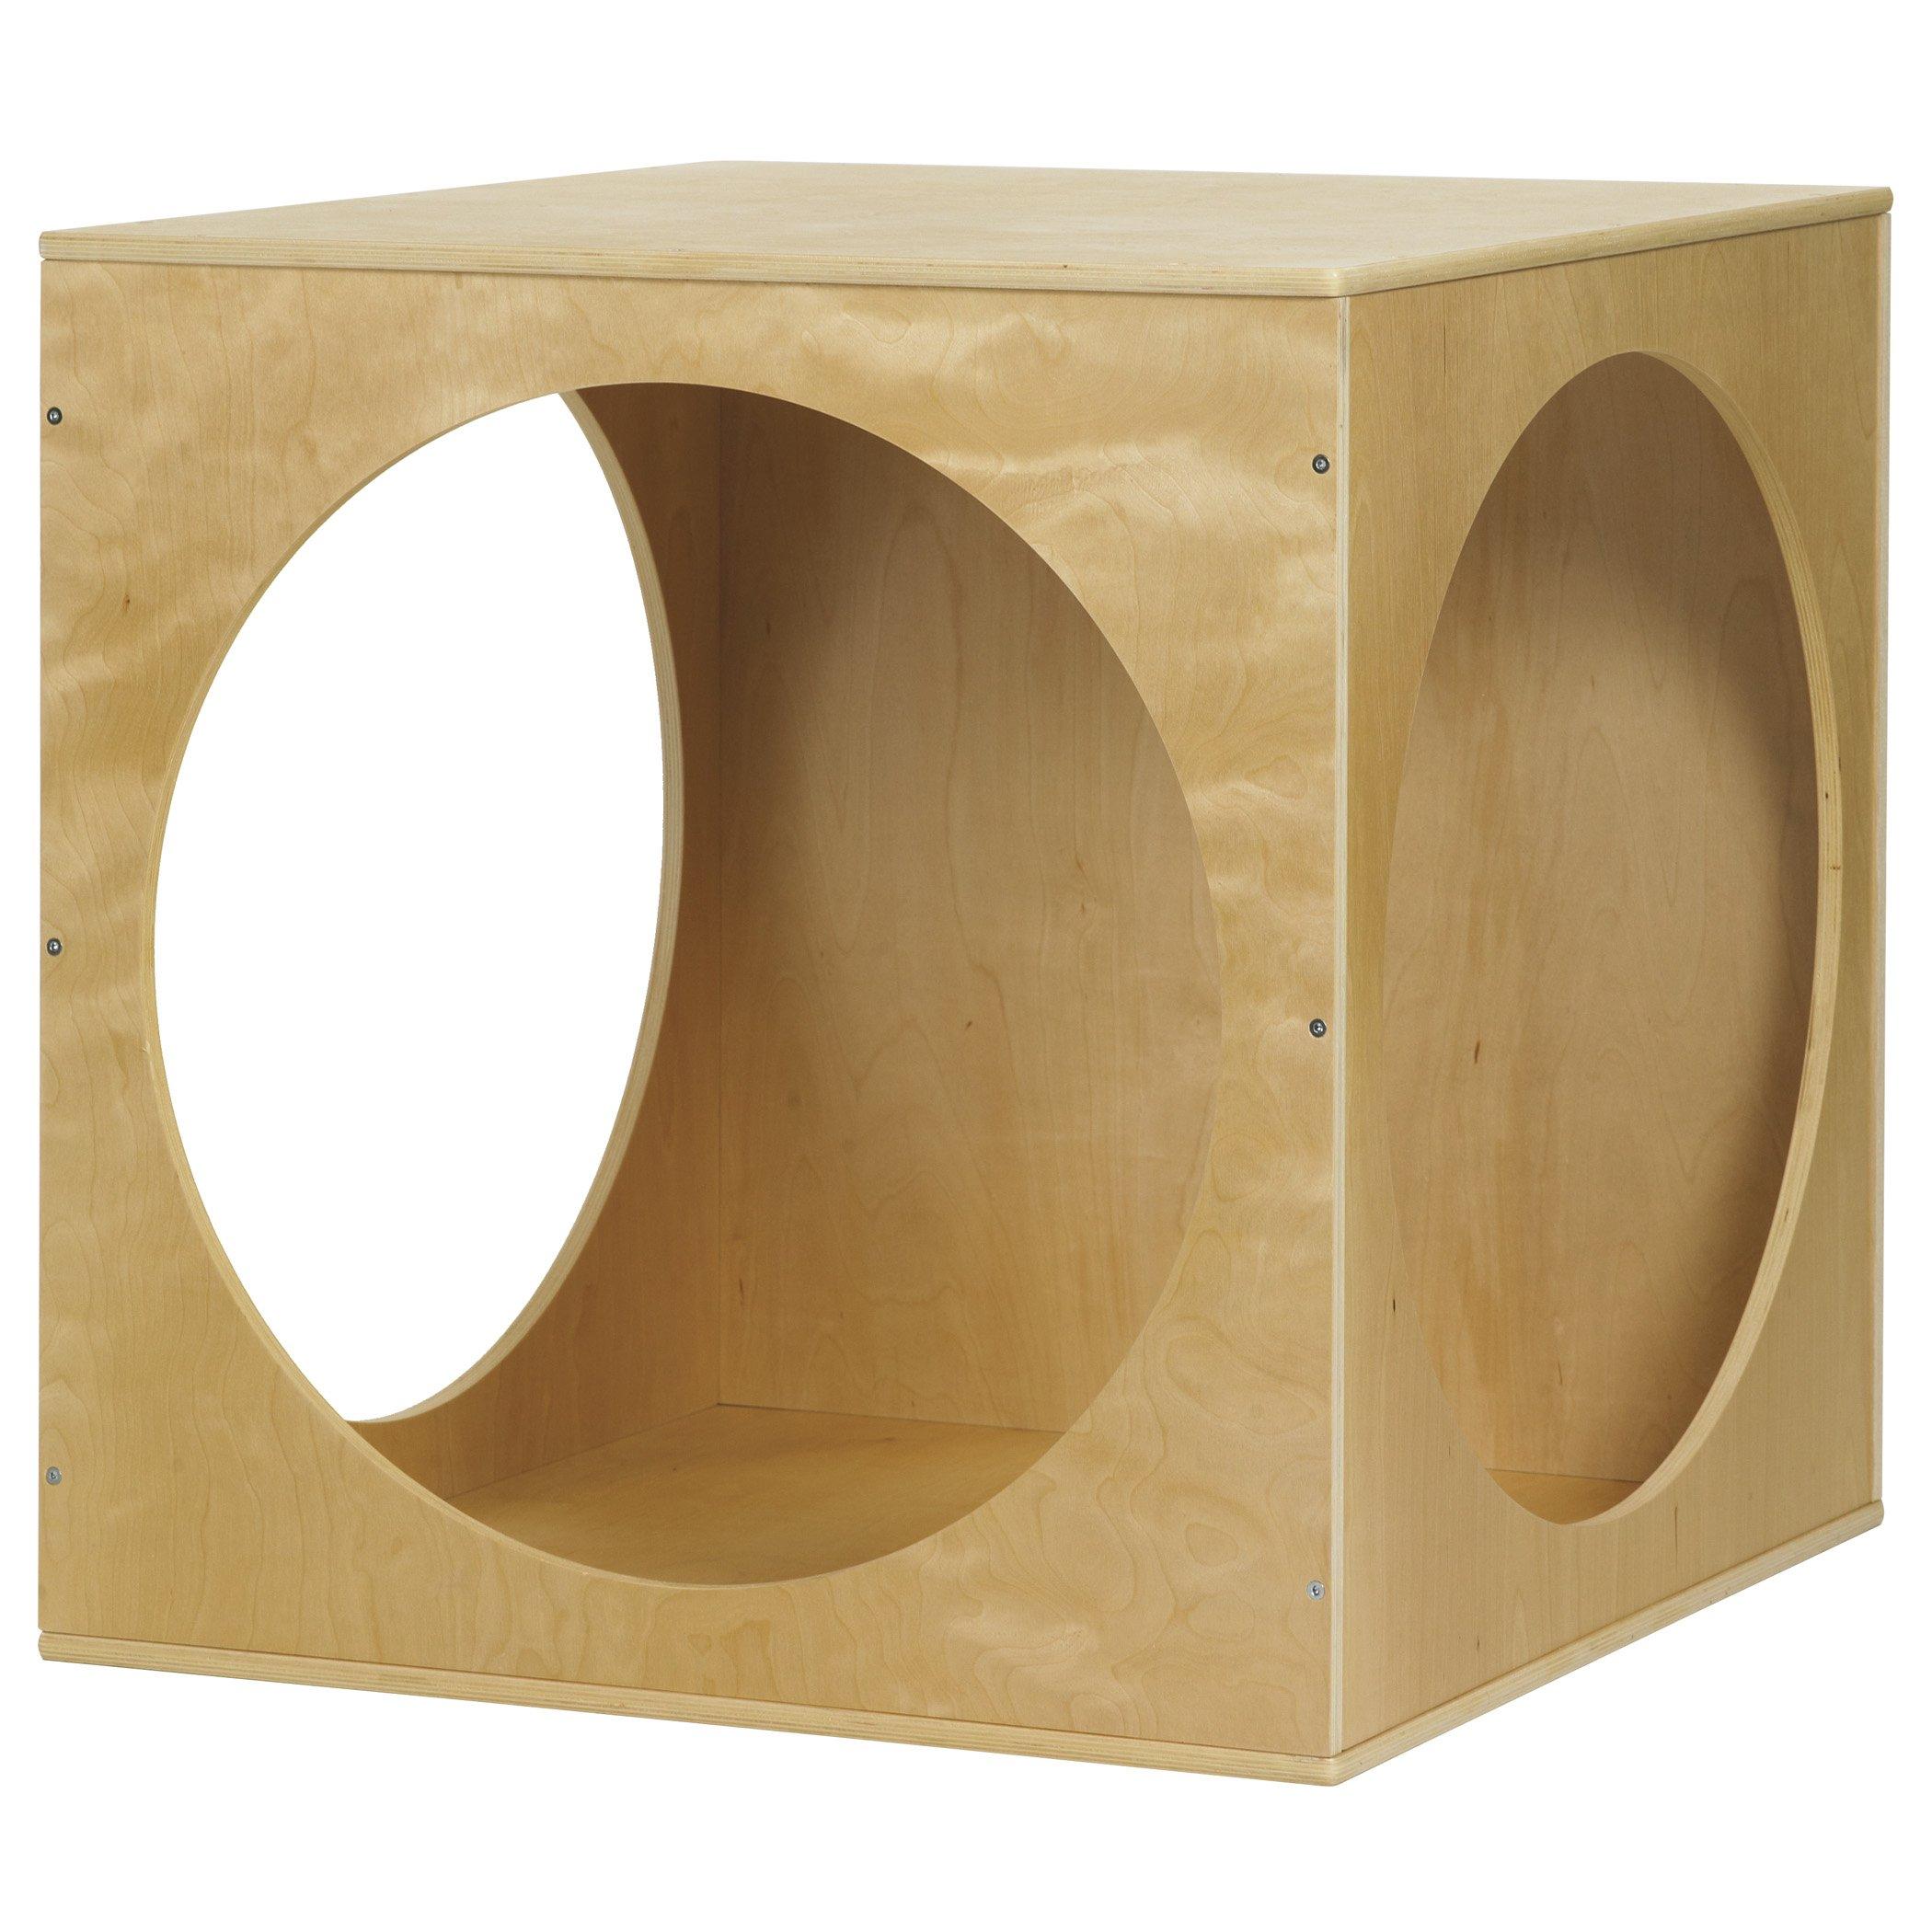 ECR4Kids Birch Hardwood Playhouse Cube